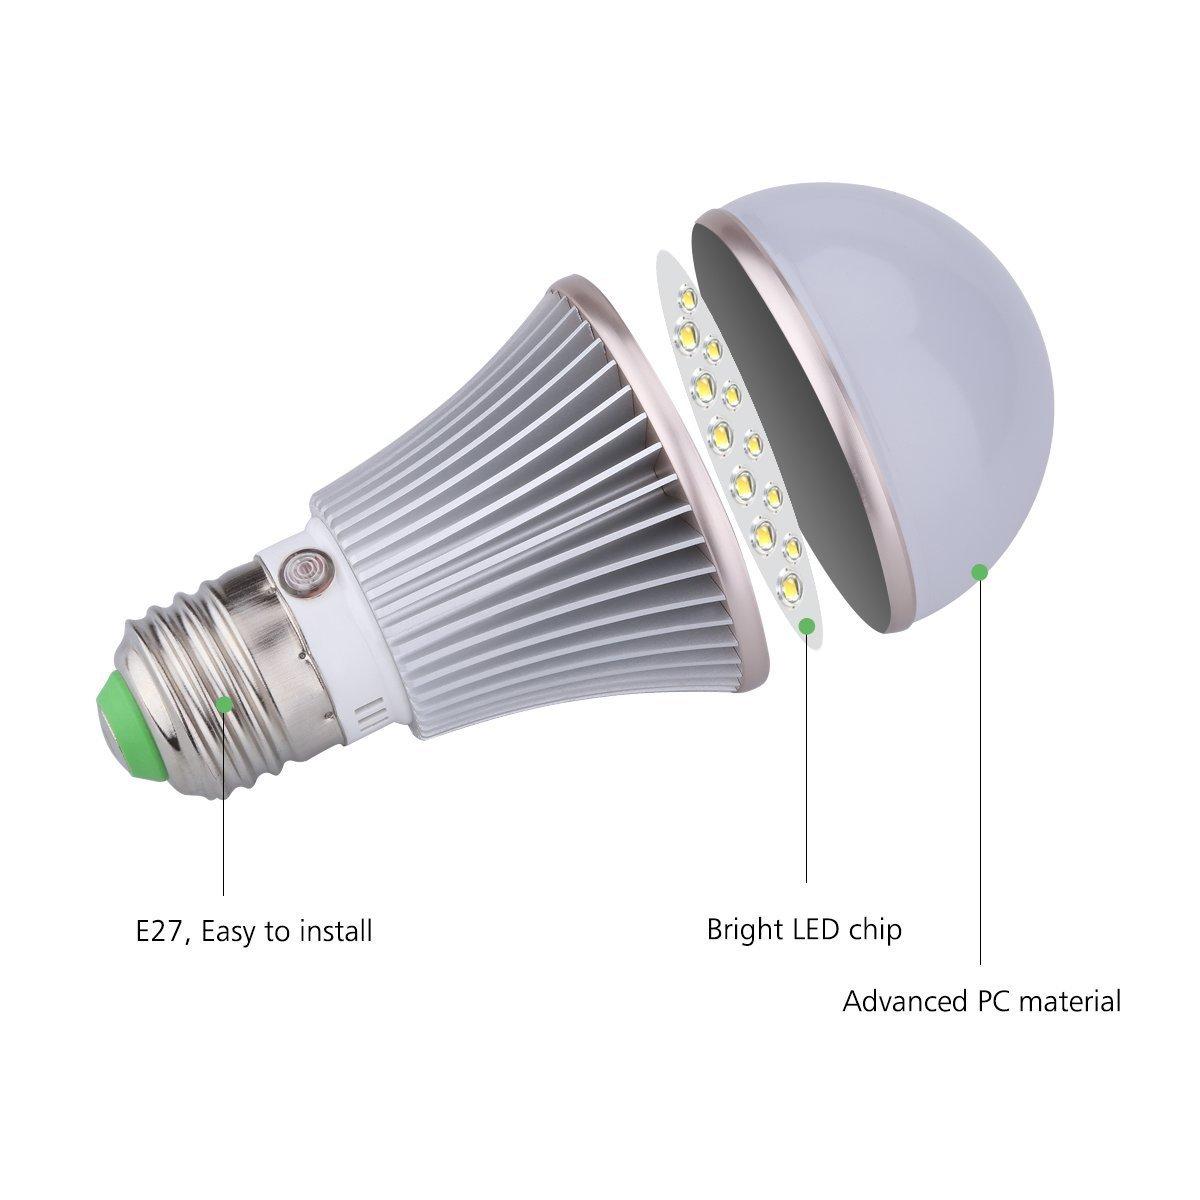 2 Pack Dusk to Dawn Light Sensor Bulb, E27 5W Lamp Post, Sensor Security Bulb Fence Post Light Outdoor with Photosensor Detection Indoor Lighting Lamp Porch Hallway Patio Garage Warm White 3000K